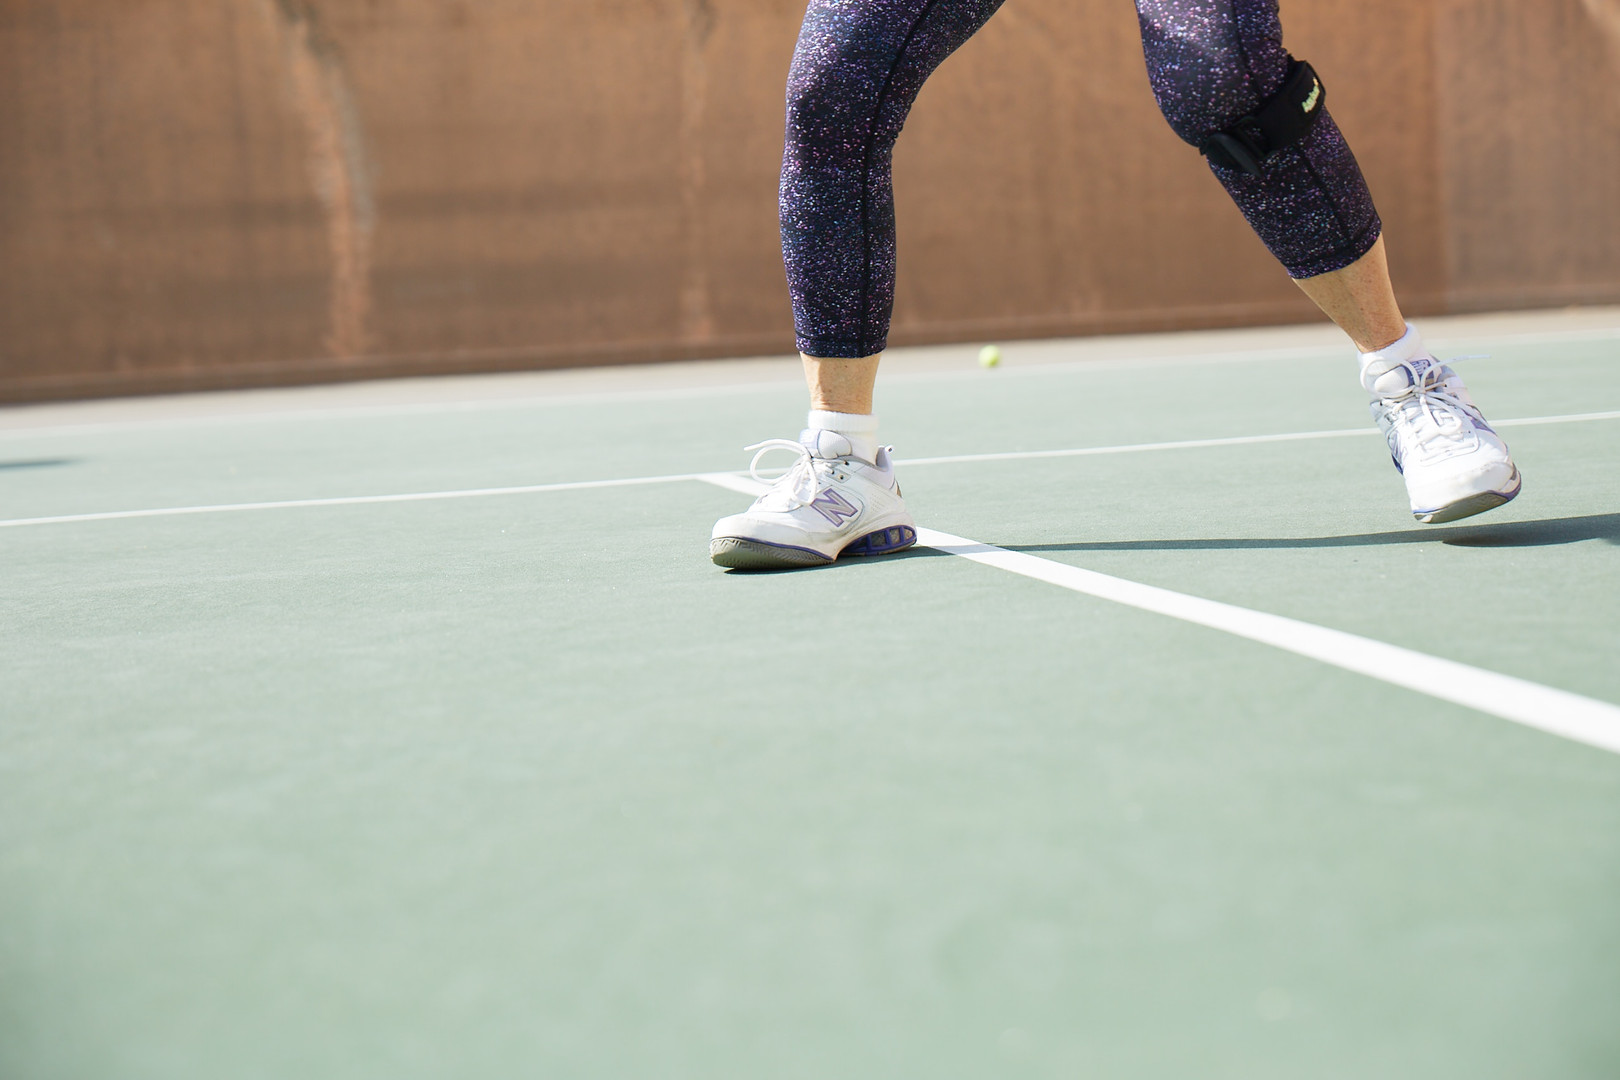 Kinetic Tennis Julie_Q6A2297.jpg